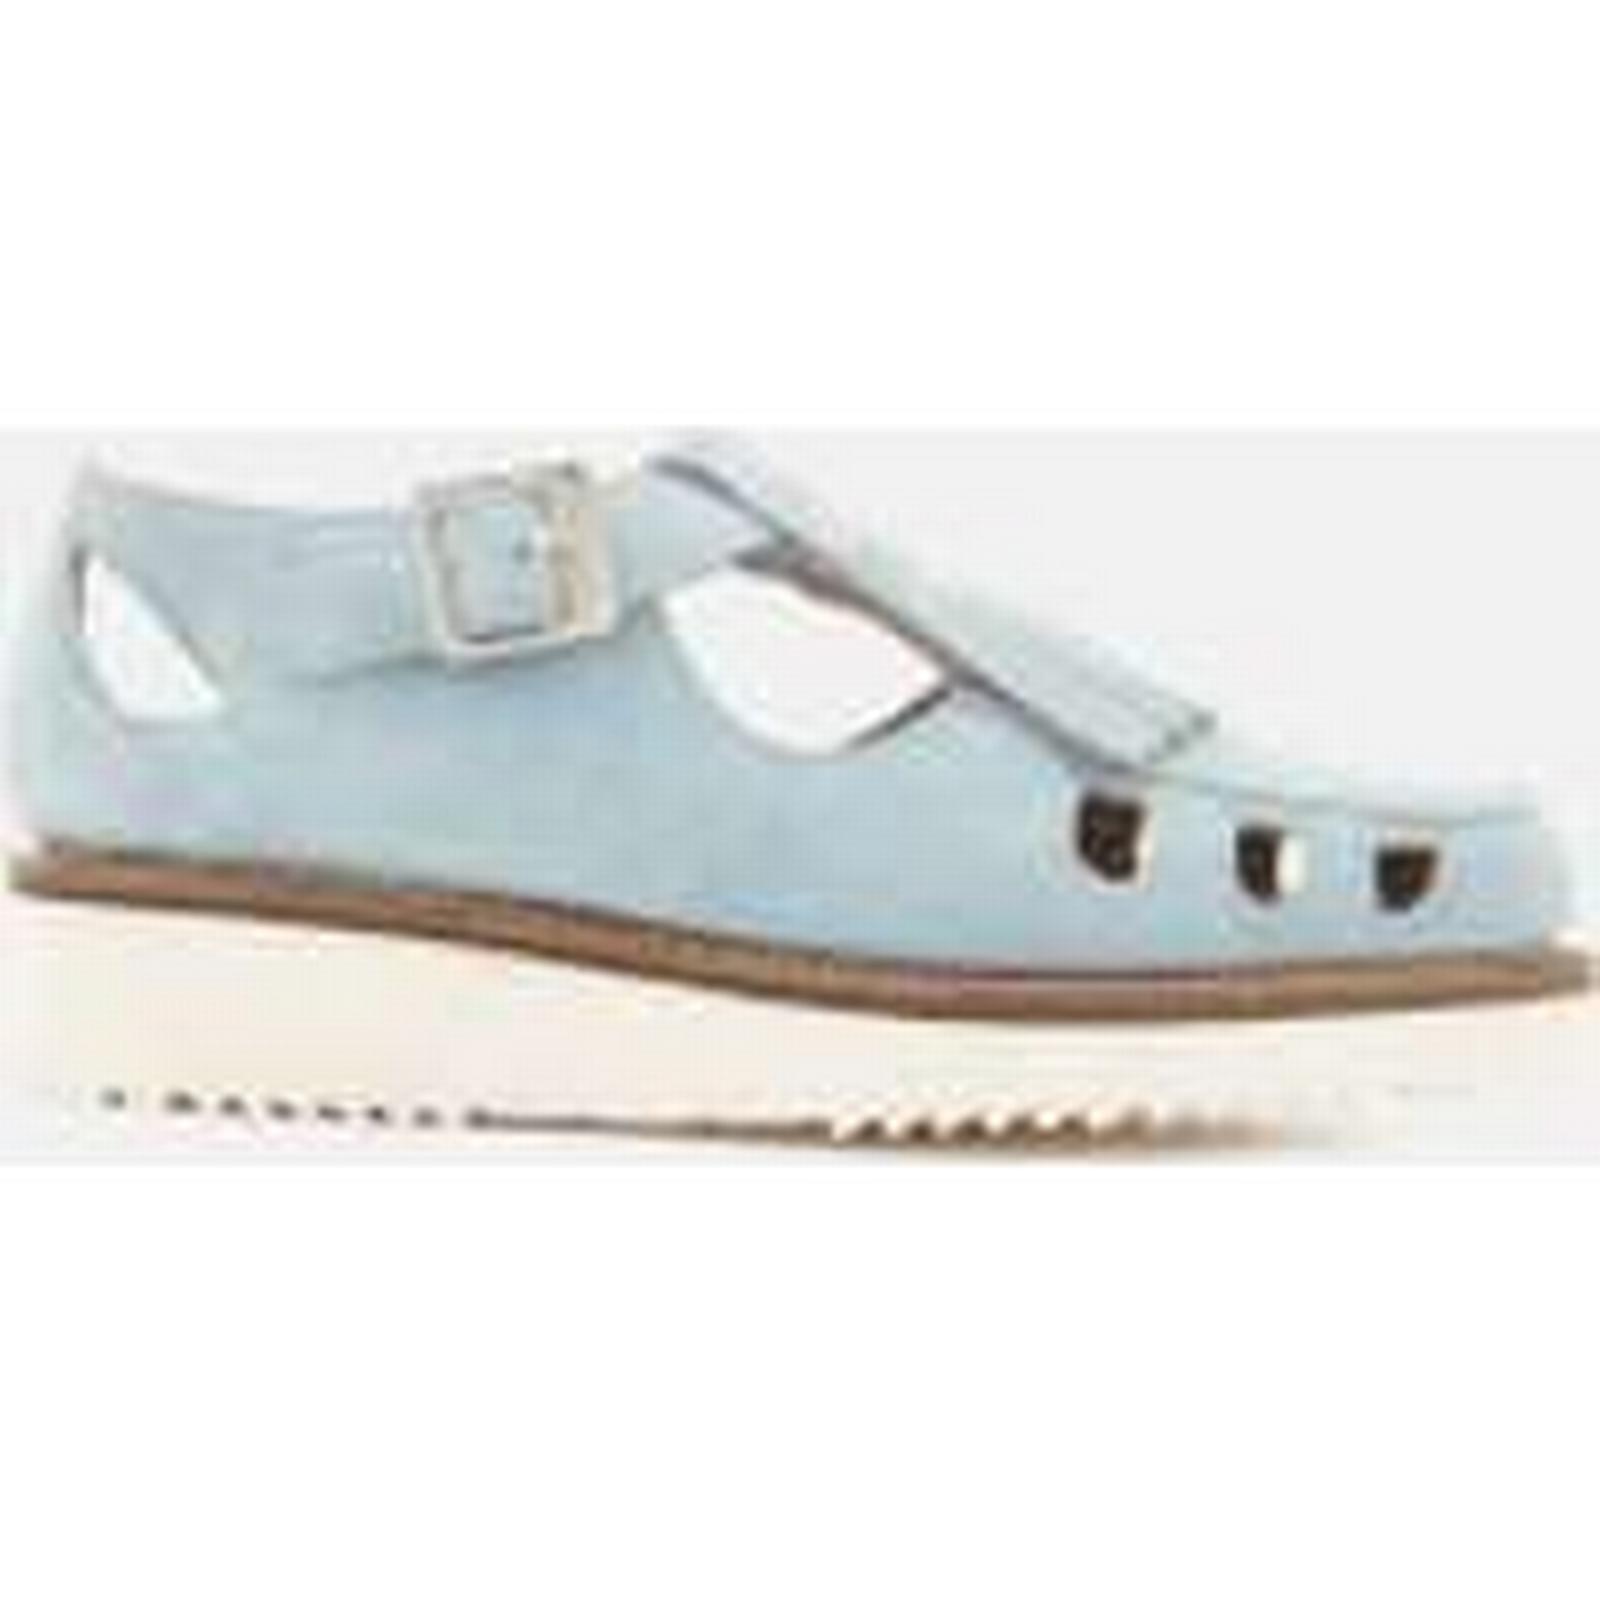 Grenson Women's Ethel - Suede Flats - Santorini - Ethel UK 4 - Blue 8f6b0c